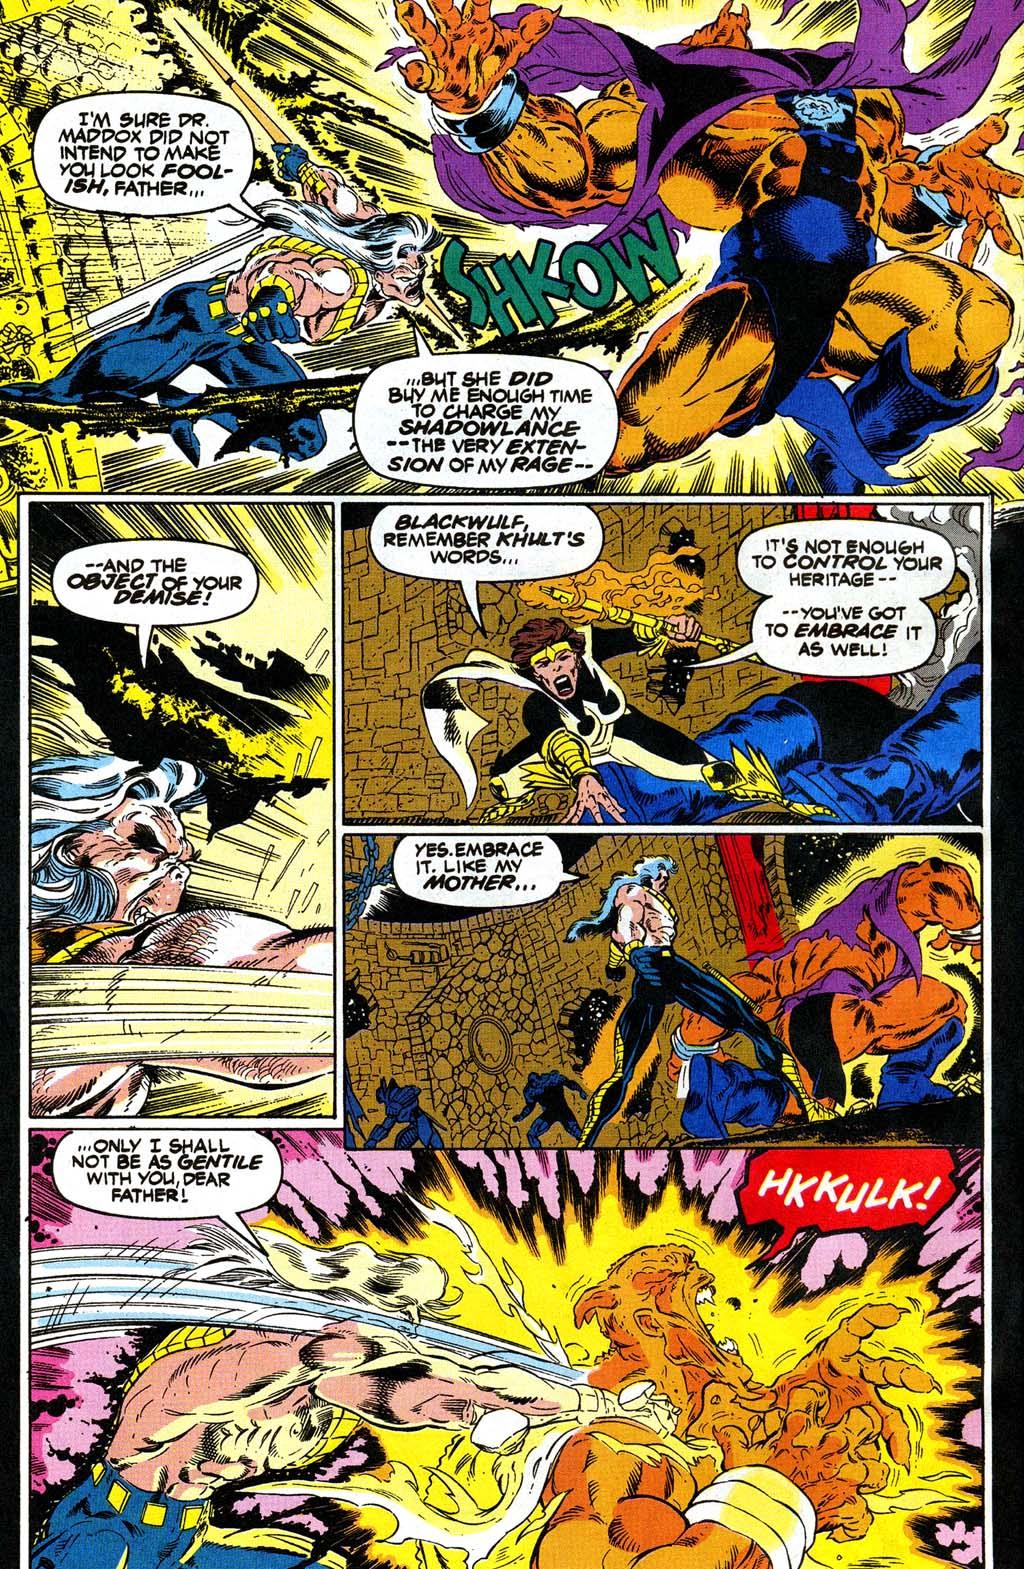 Read online Blackwulf comic -  Issue #10 - 16